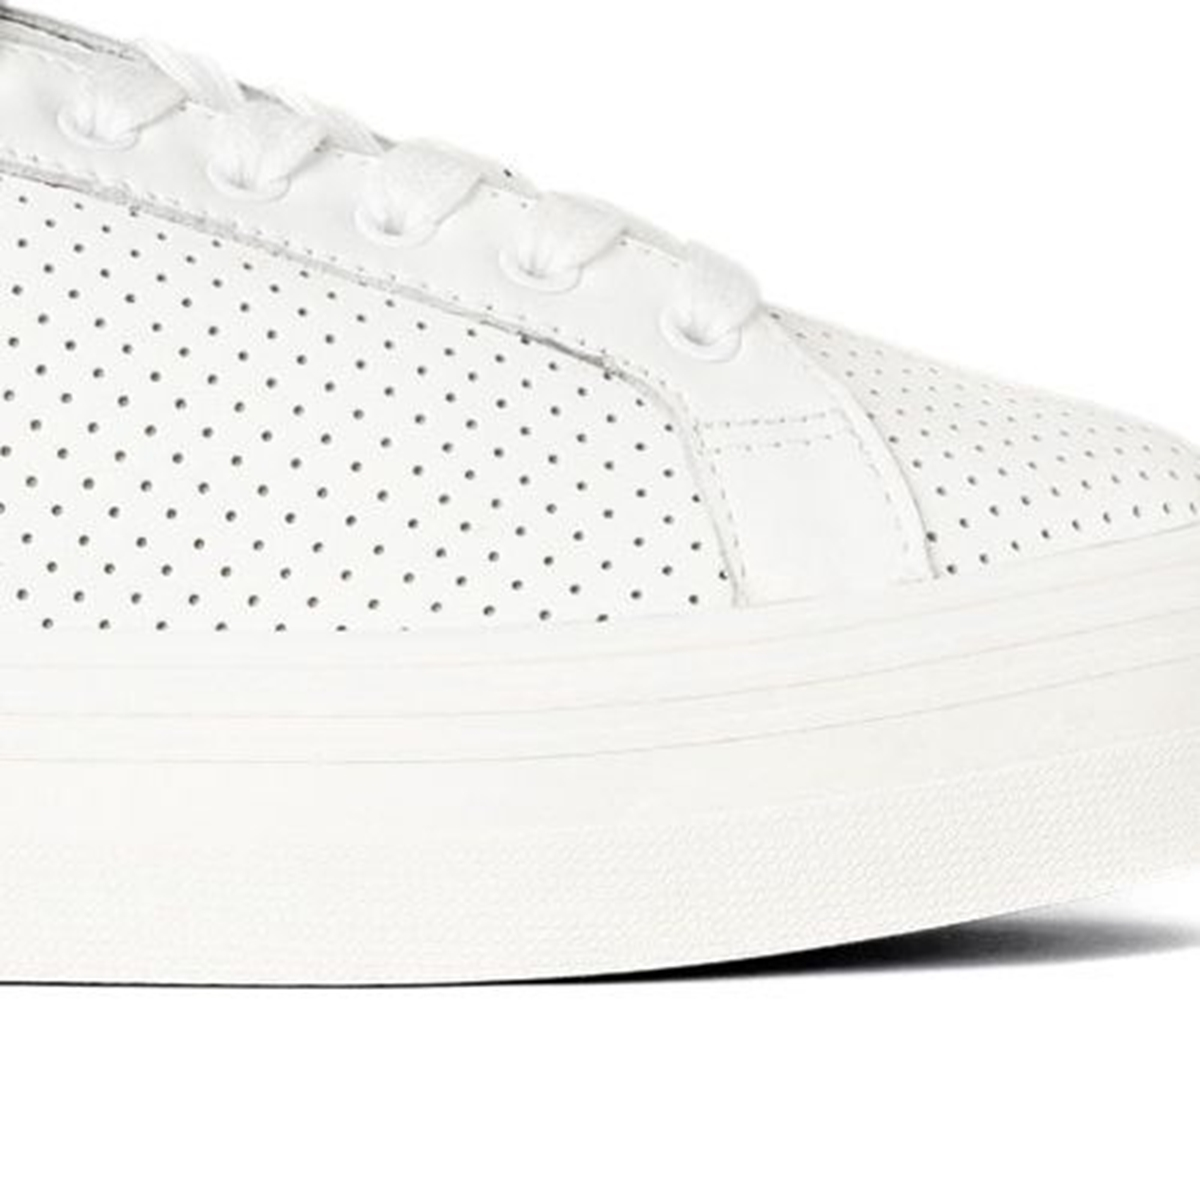 PLATO-11659-WHITE プラト ホワイト